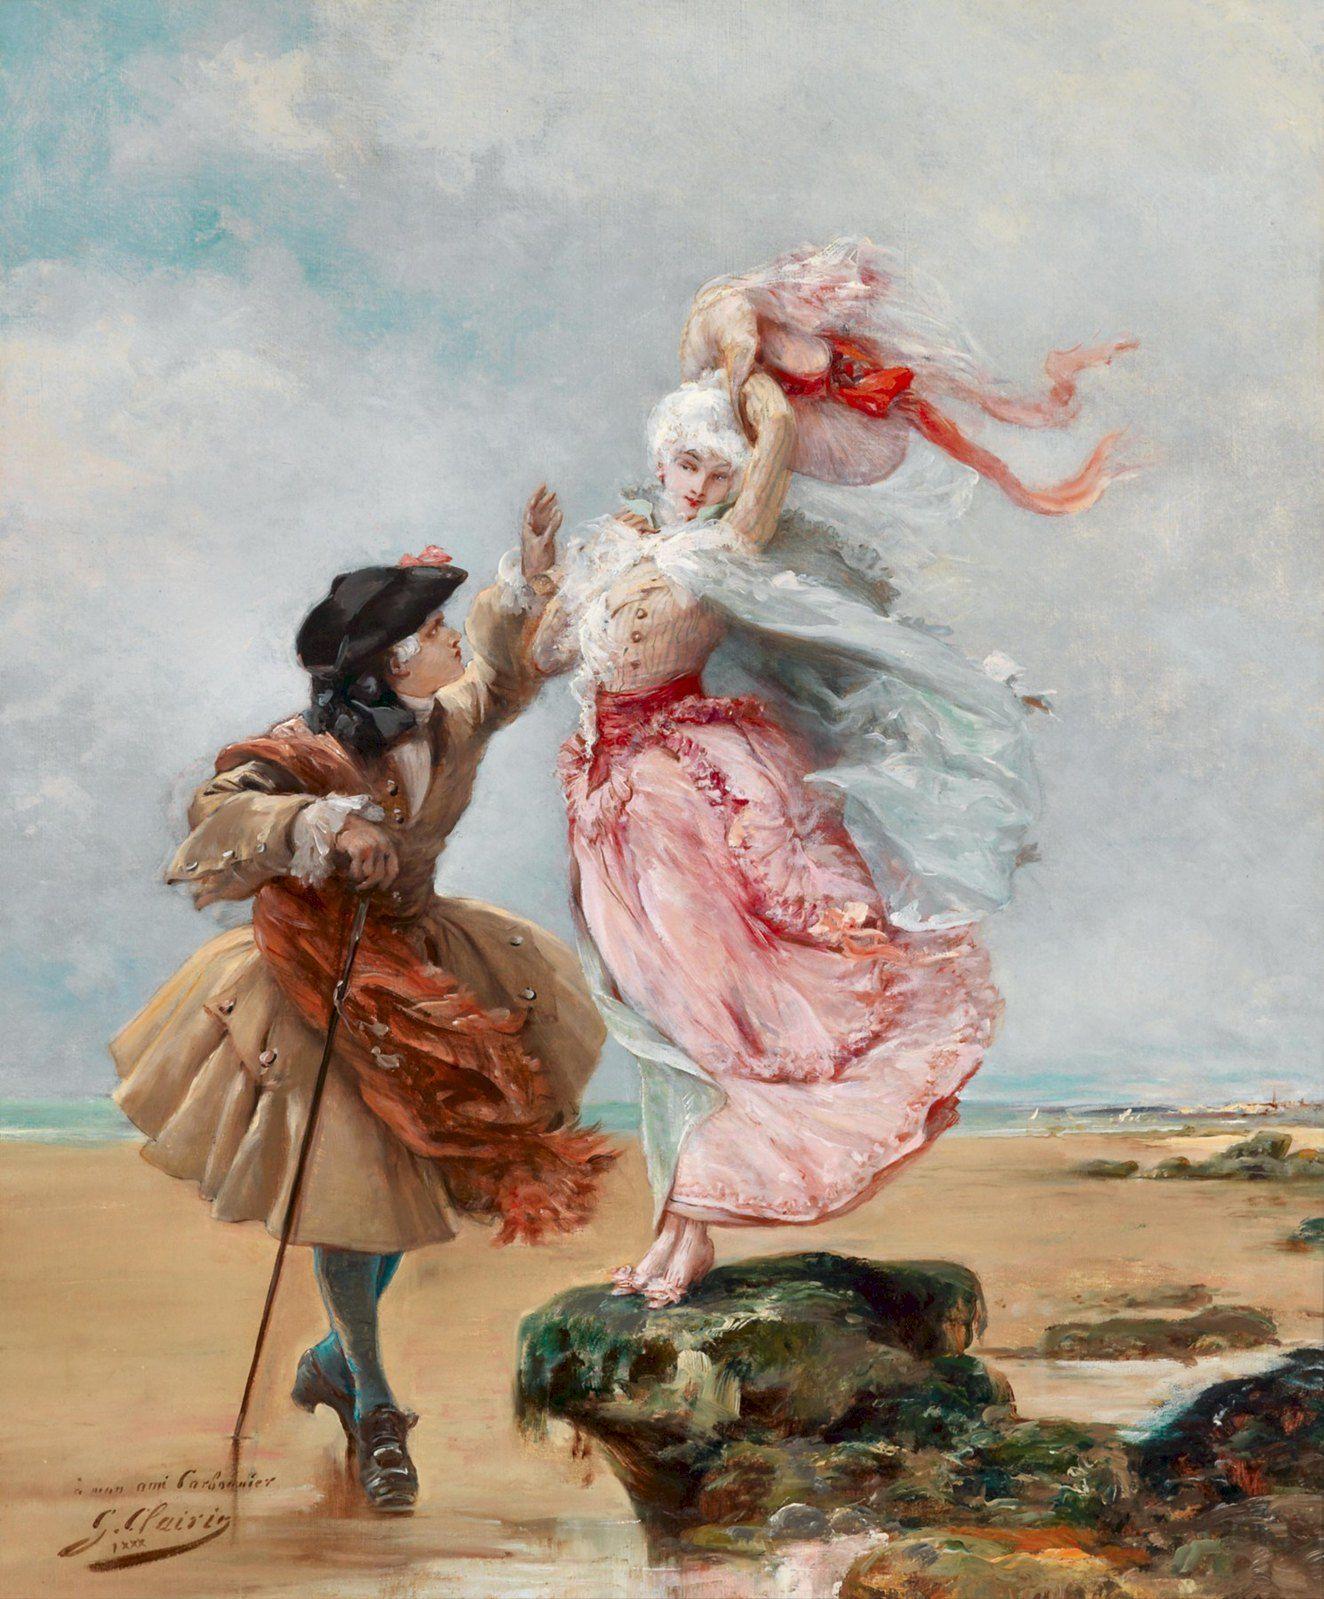 Elegant Romantic Paintings: Pin On Artists I